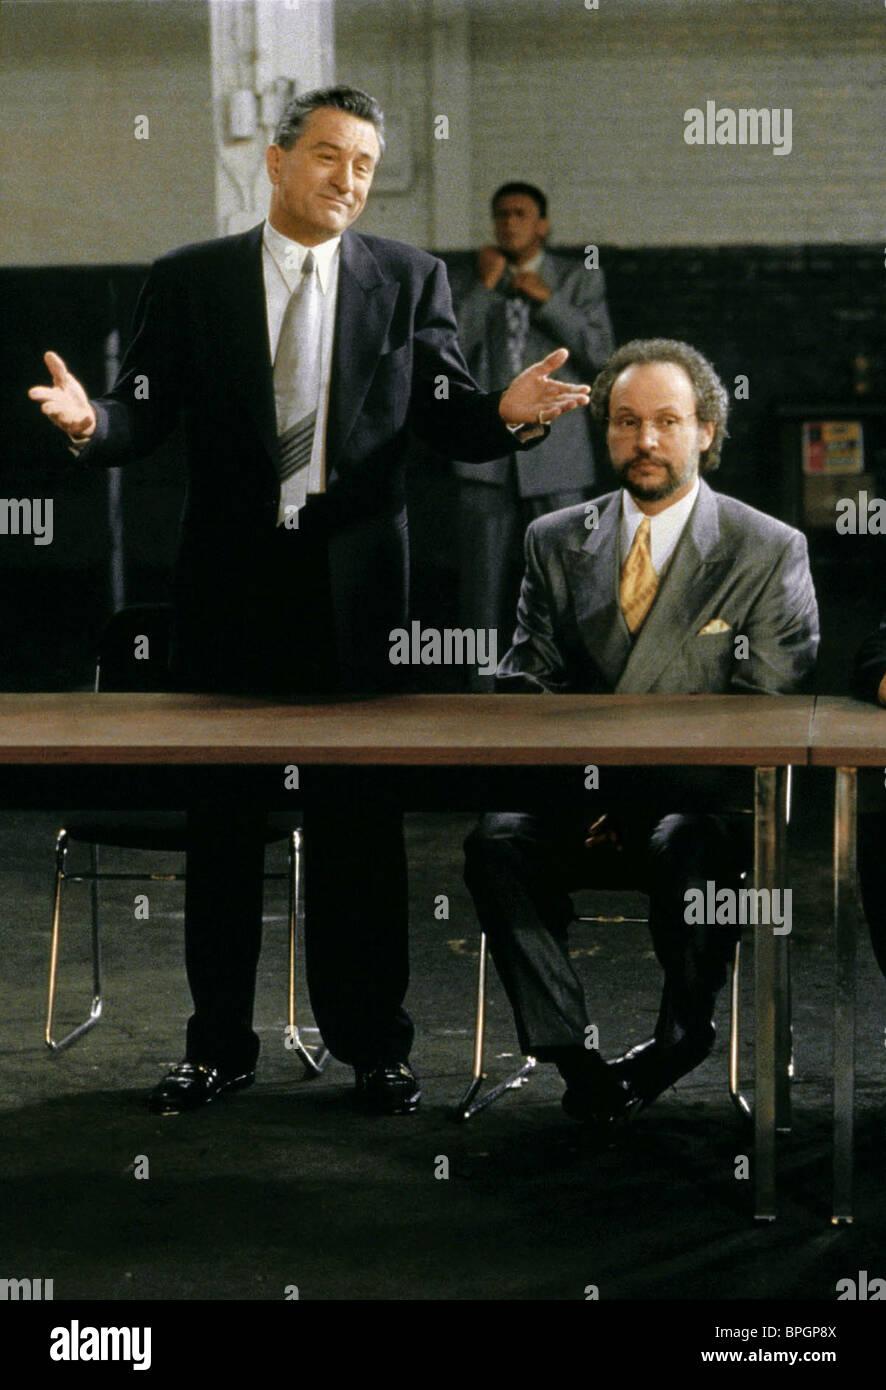 Robert De Niro Billy Crystal Analyze This 1999 Stock Photo Alamy